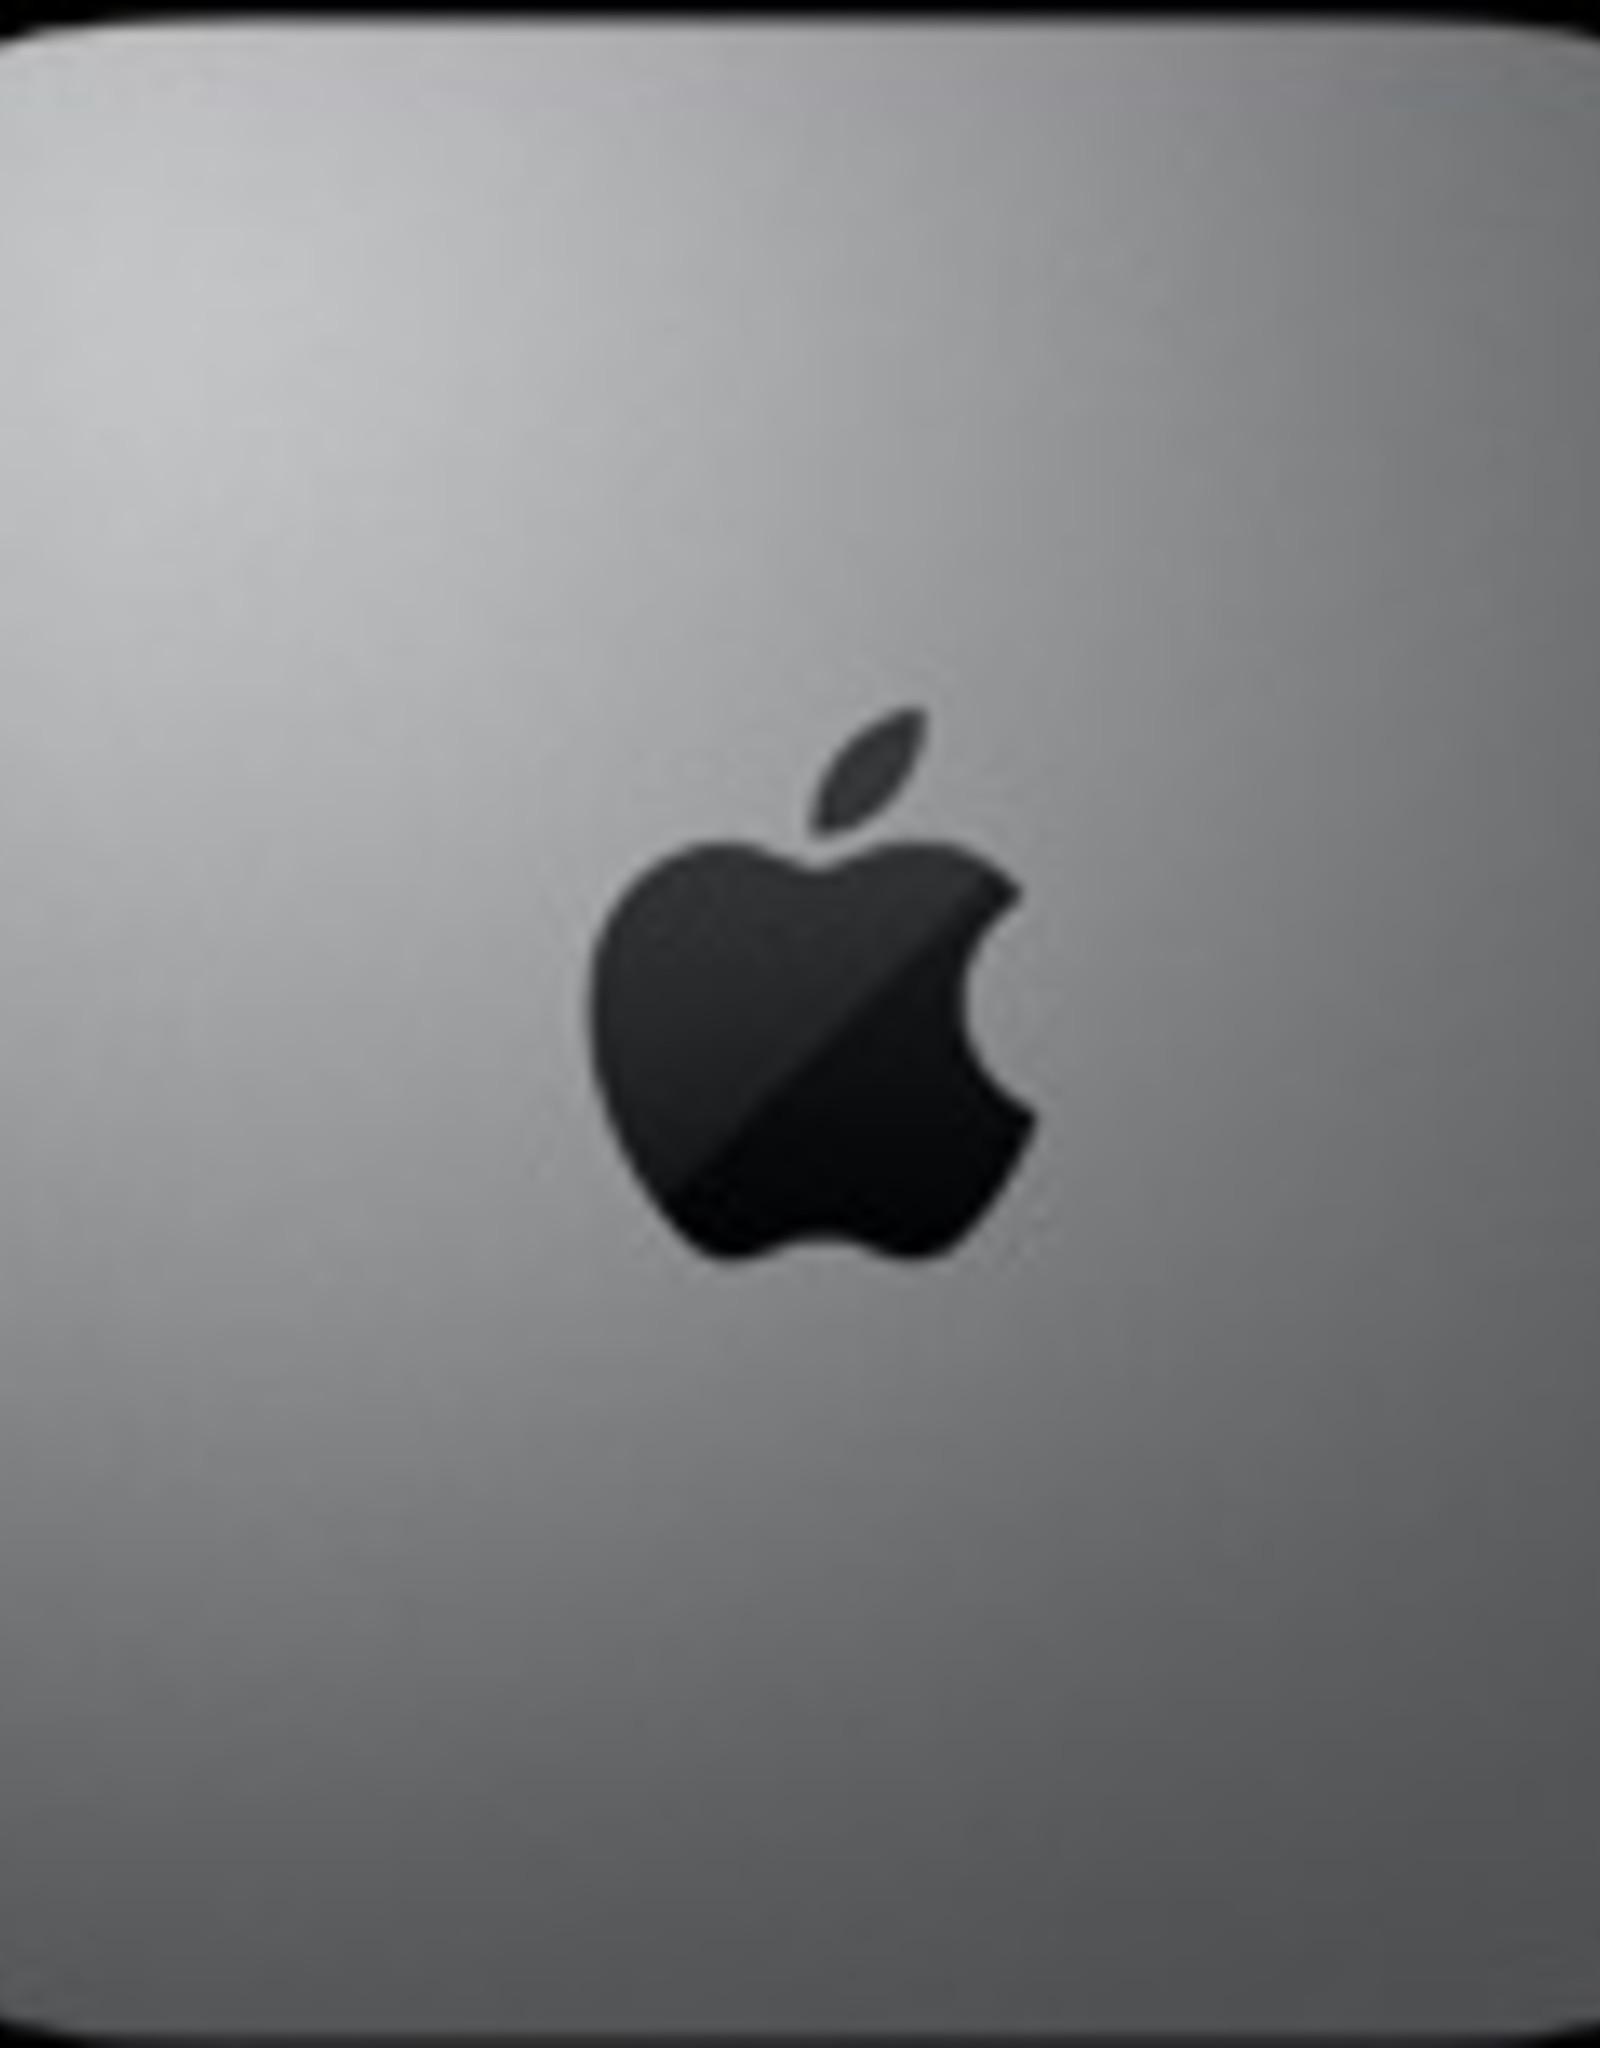 Apple MAC MINI - M1 CHIP (2020-M1LE)